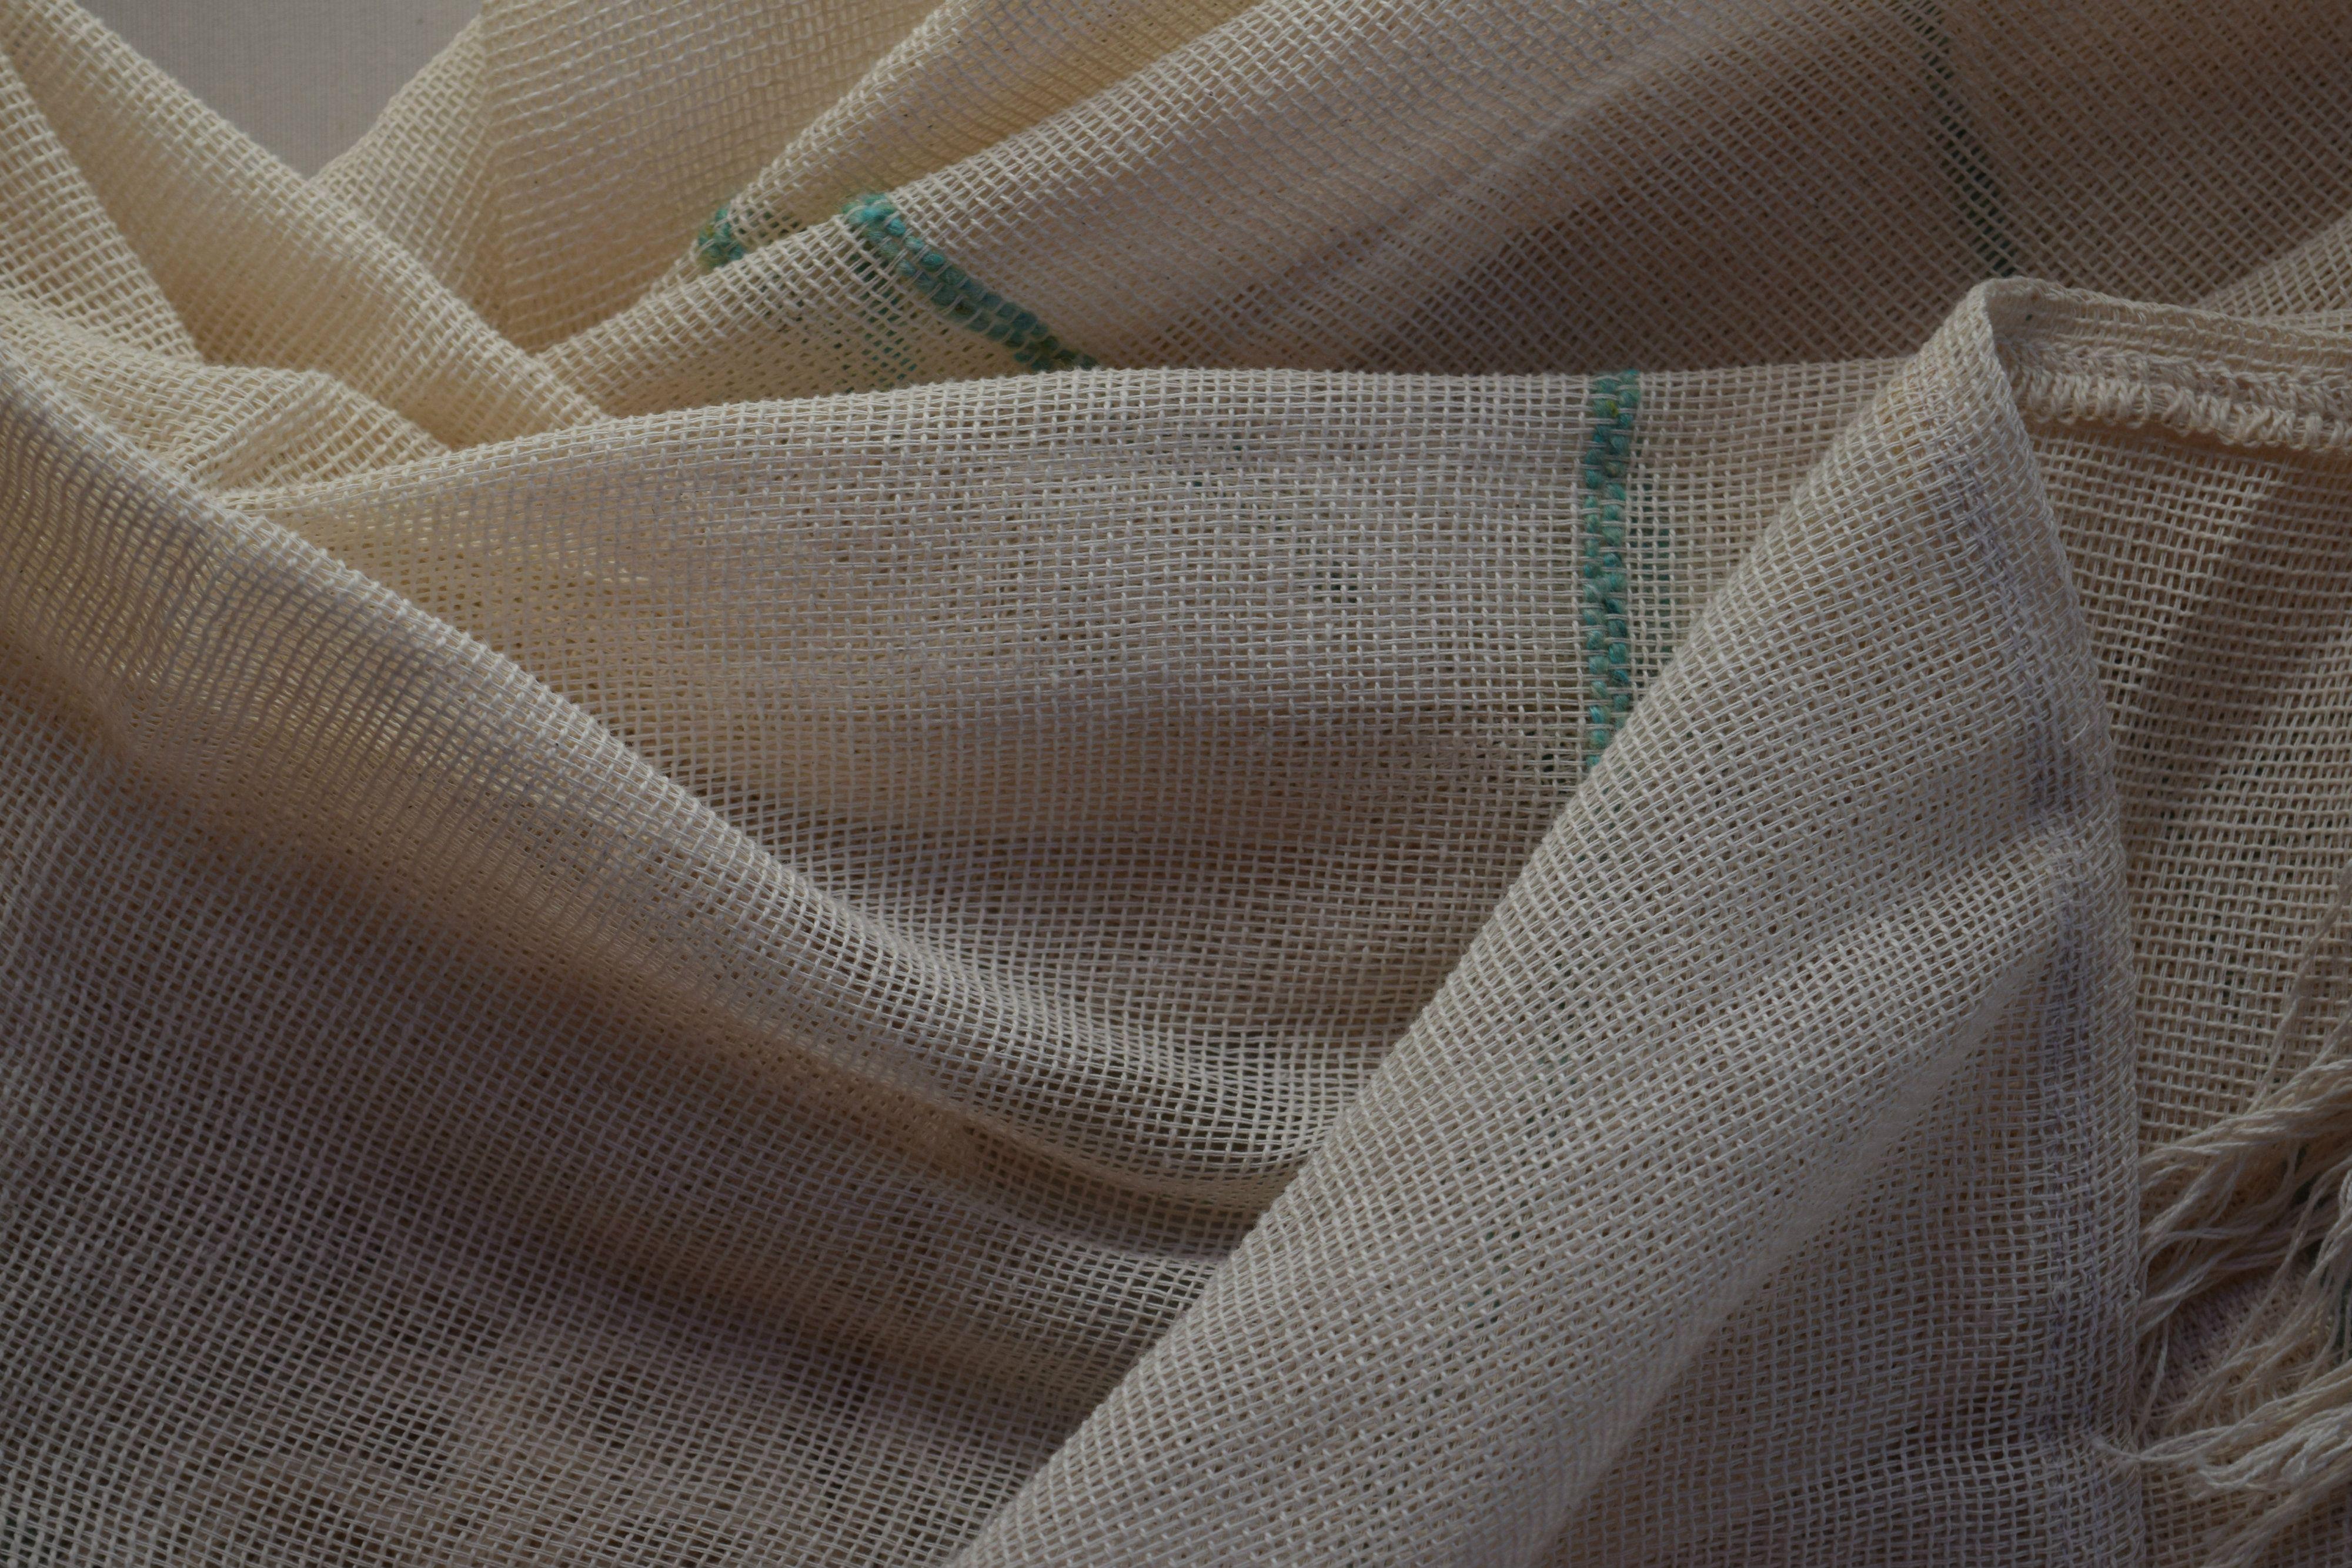 Hilo 100 % algodón tejido en telar